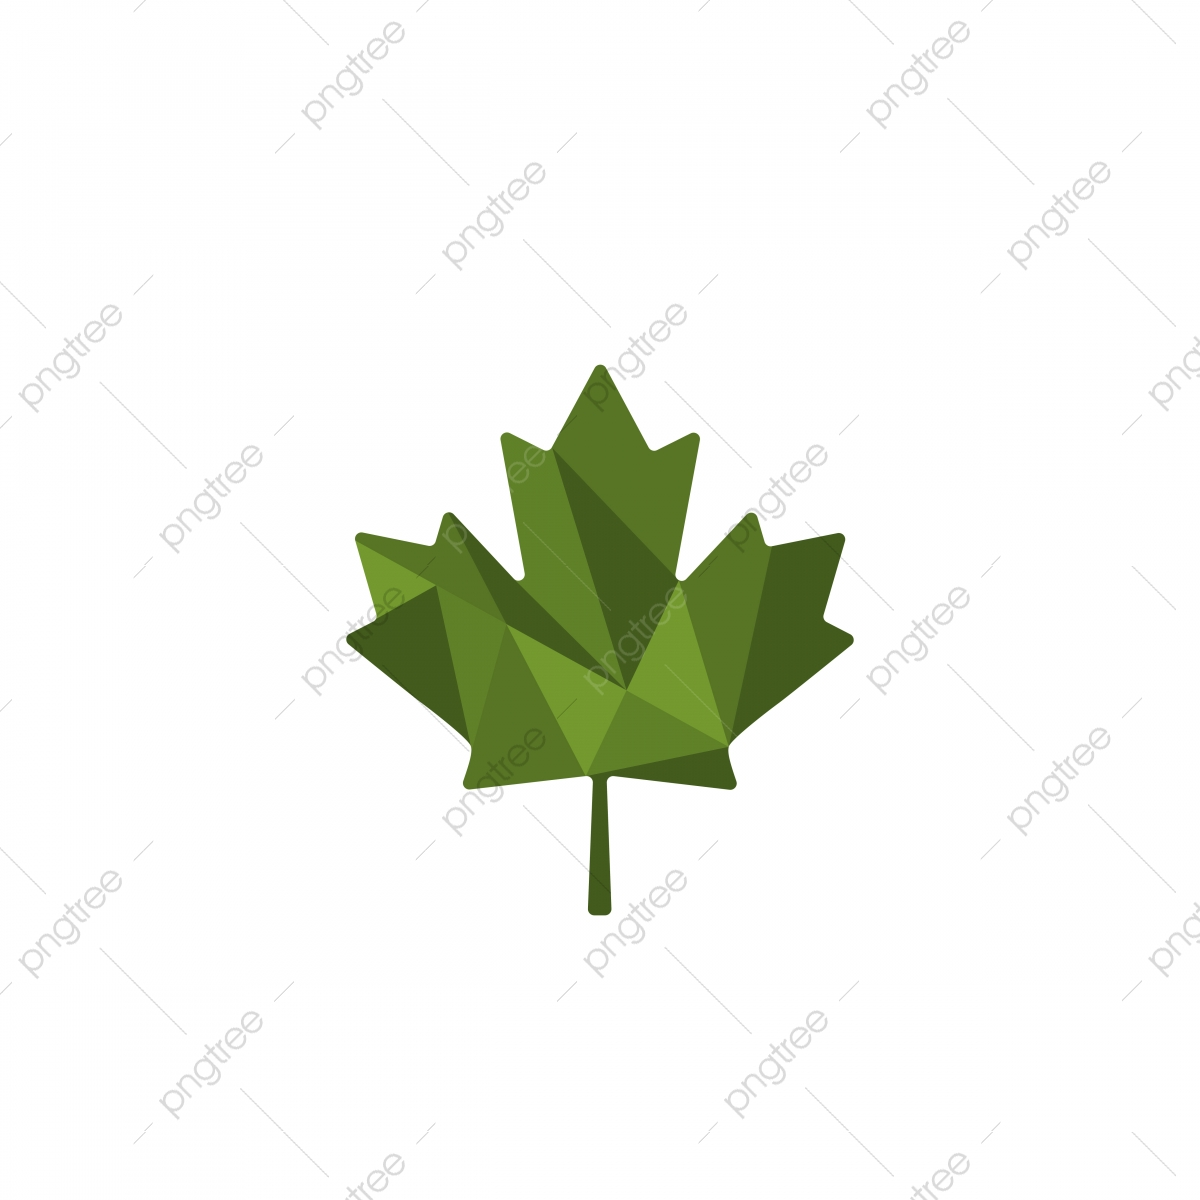 Elemento De Icone Do Icone Da Ilustracao Vectorial Da Folha Verde Da Cannabis Modelo Para Download Gratuito No Pngtree